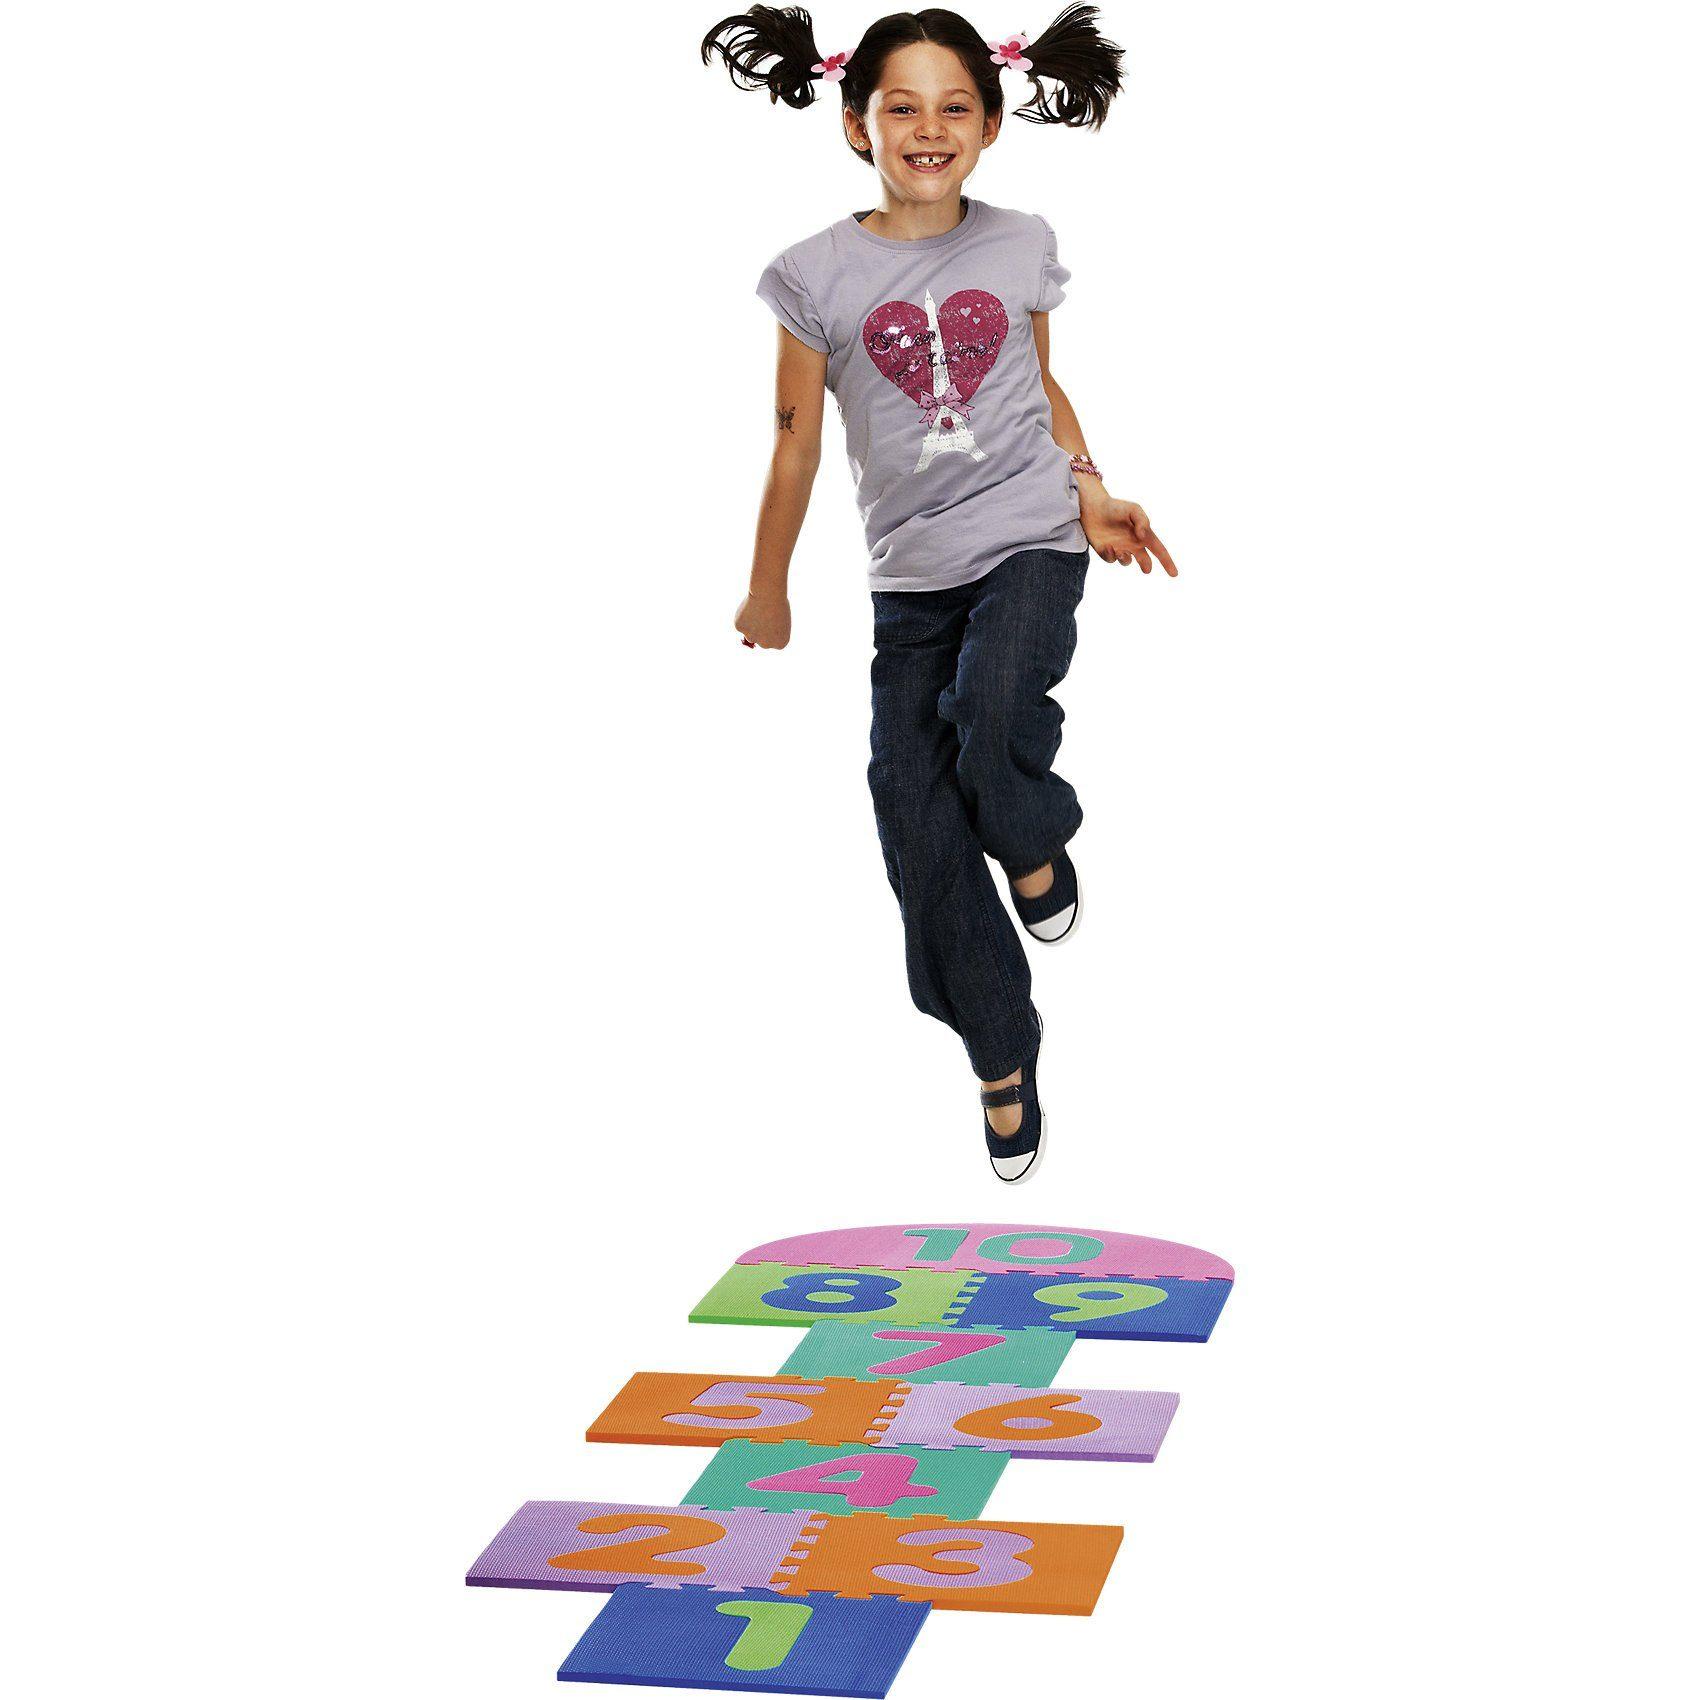 Playshoes Hüpfspiel Puzzlematte 14teilig